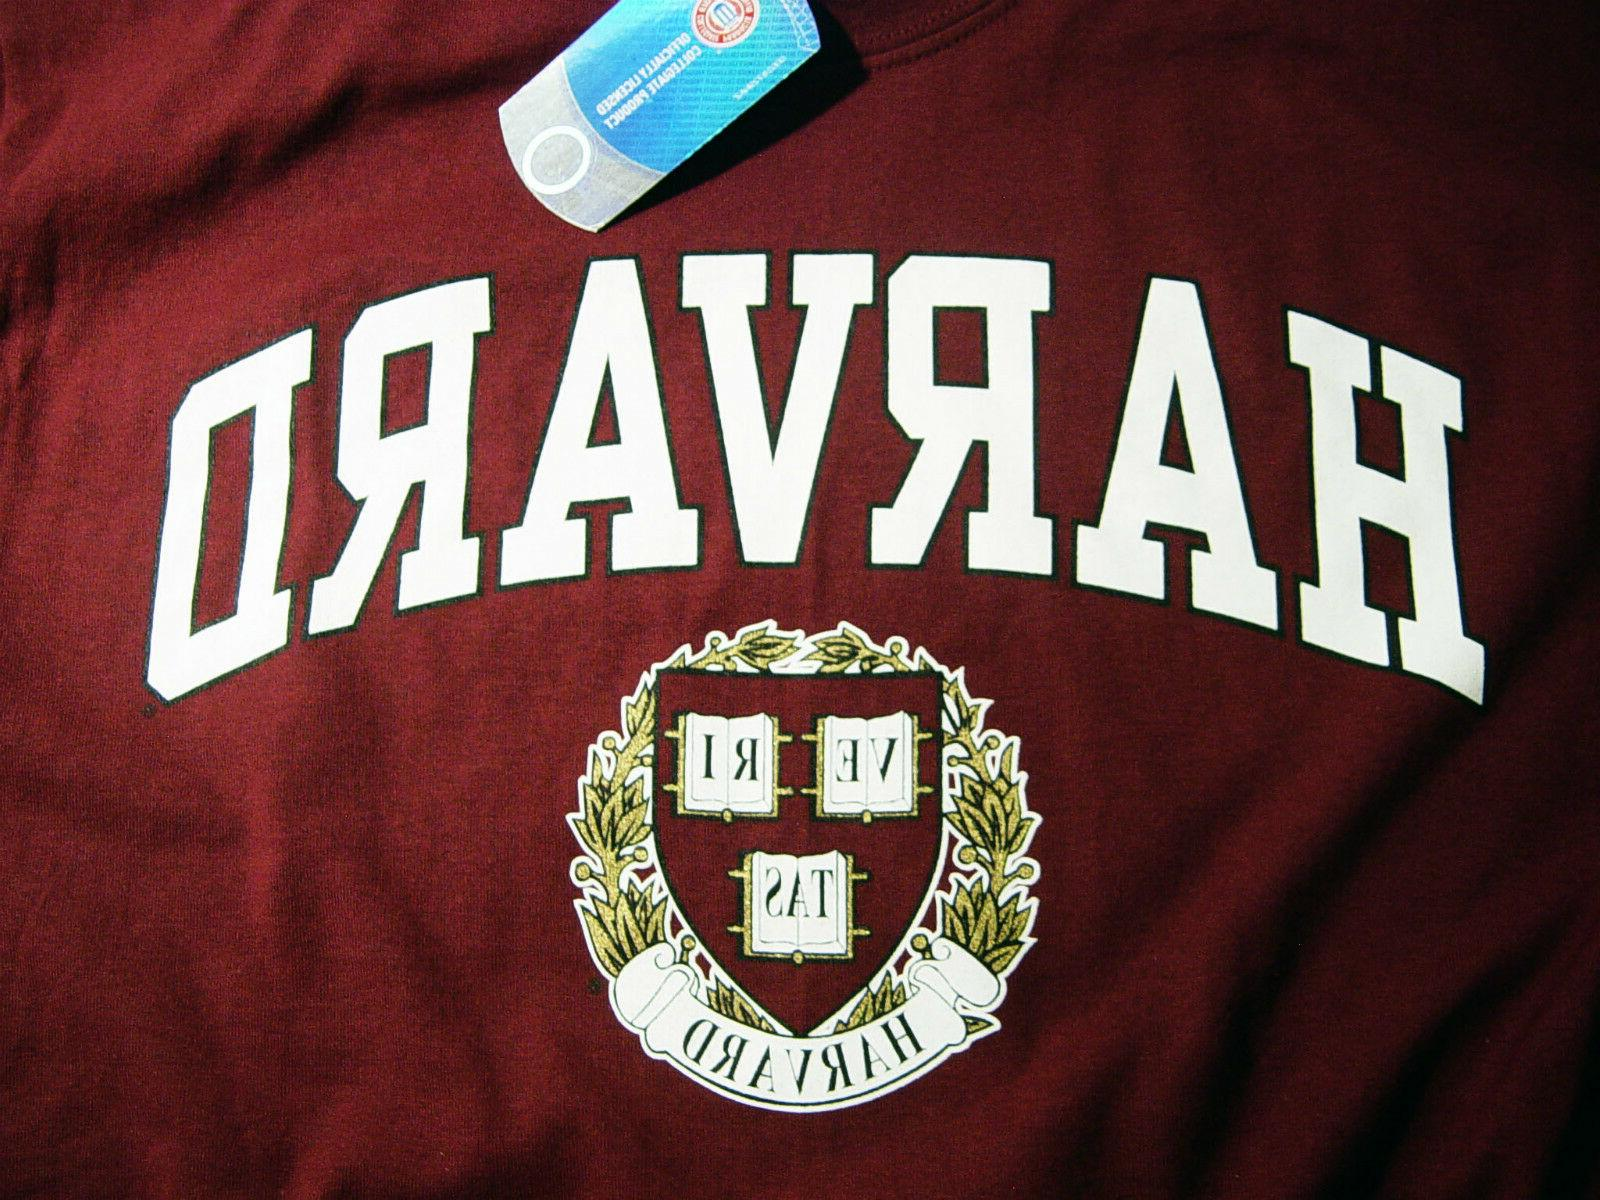 Harvard Shirt Apparel